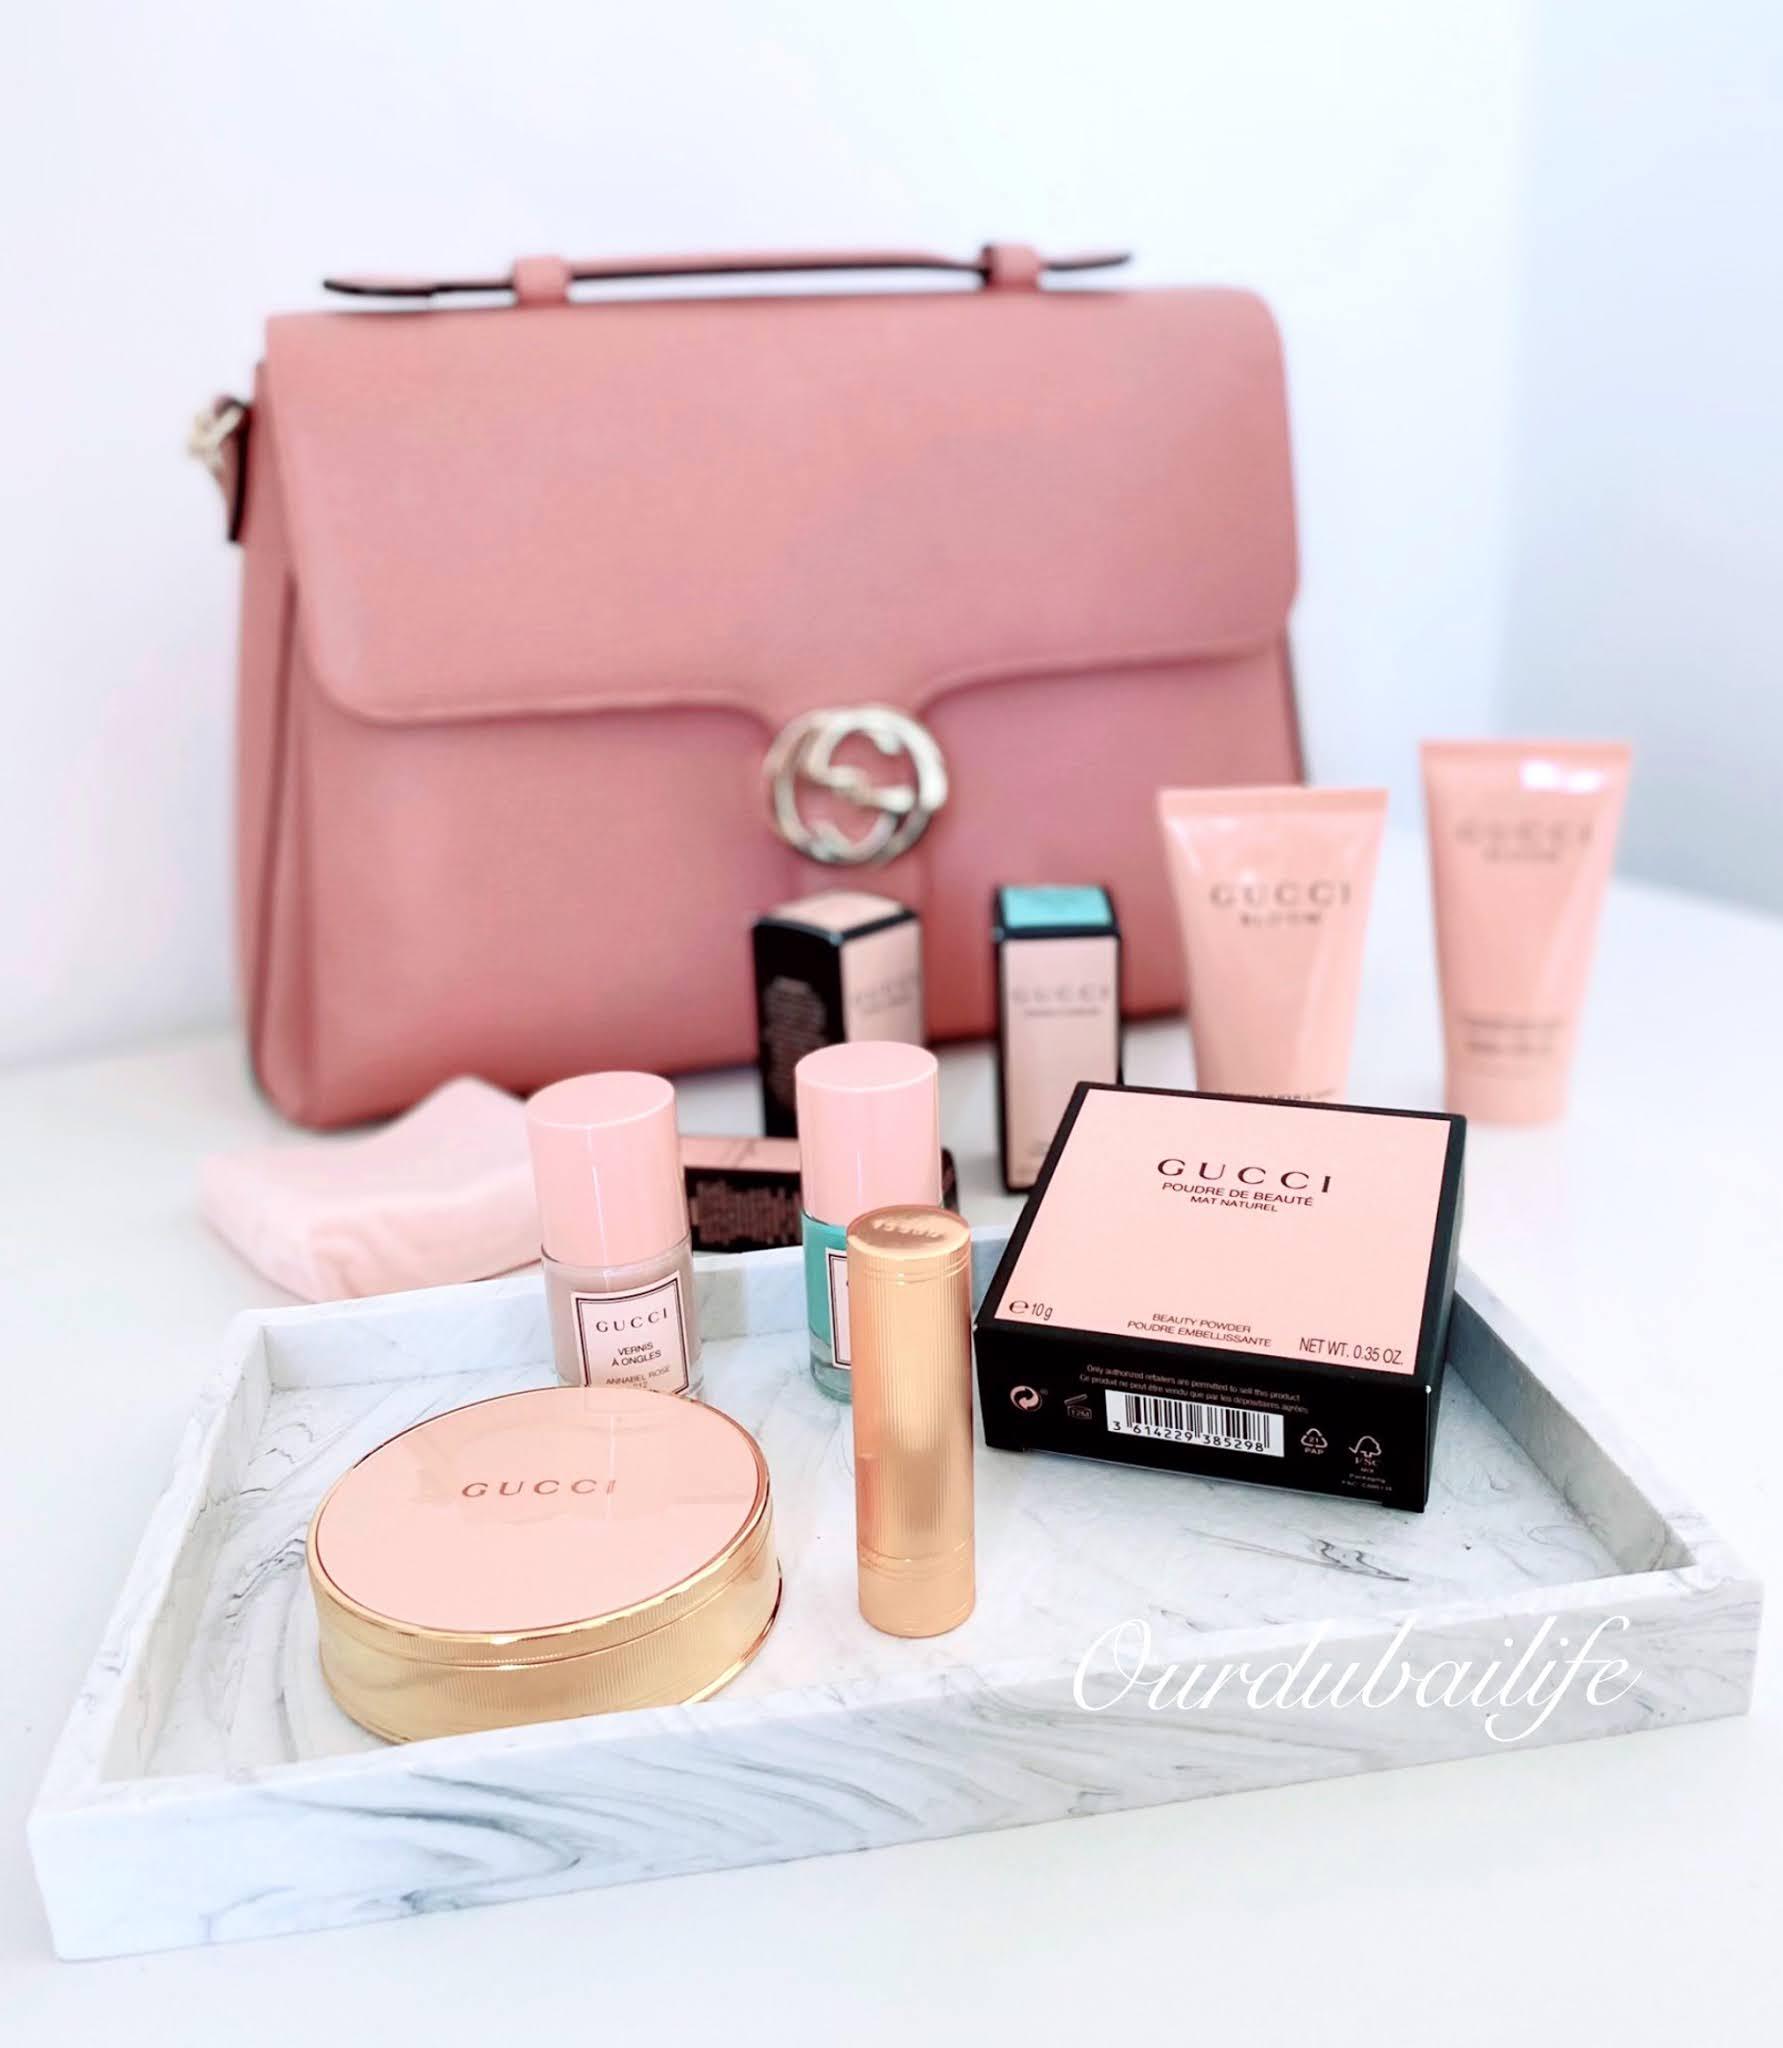 Gucci Pink bag and Gucci 2020 makeup